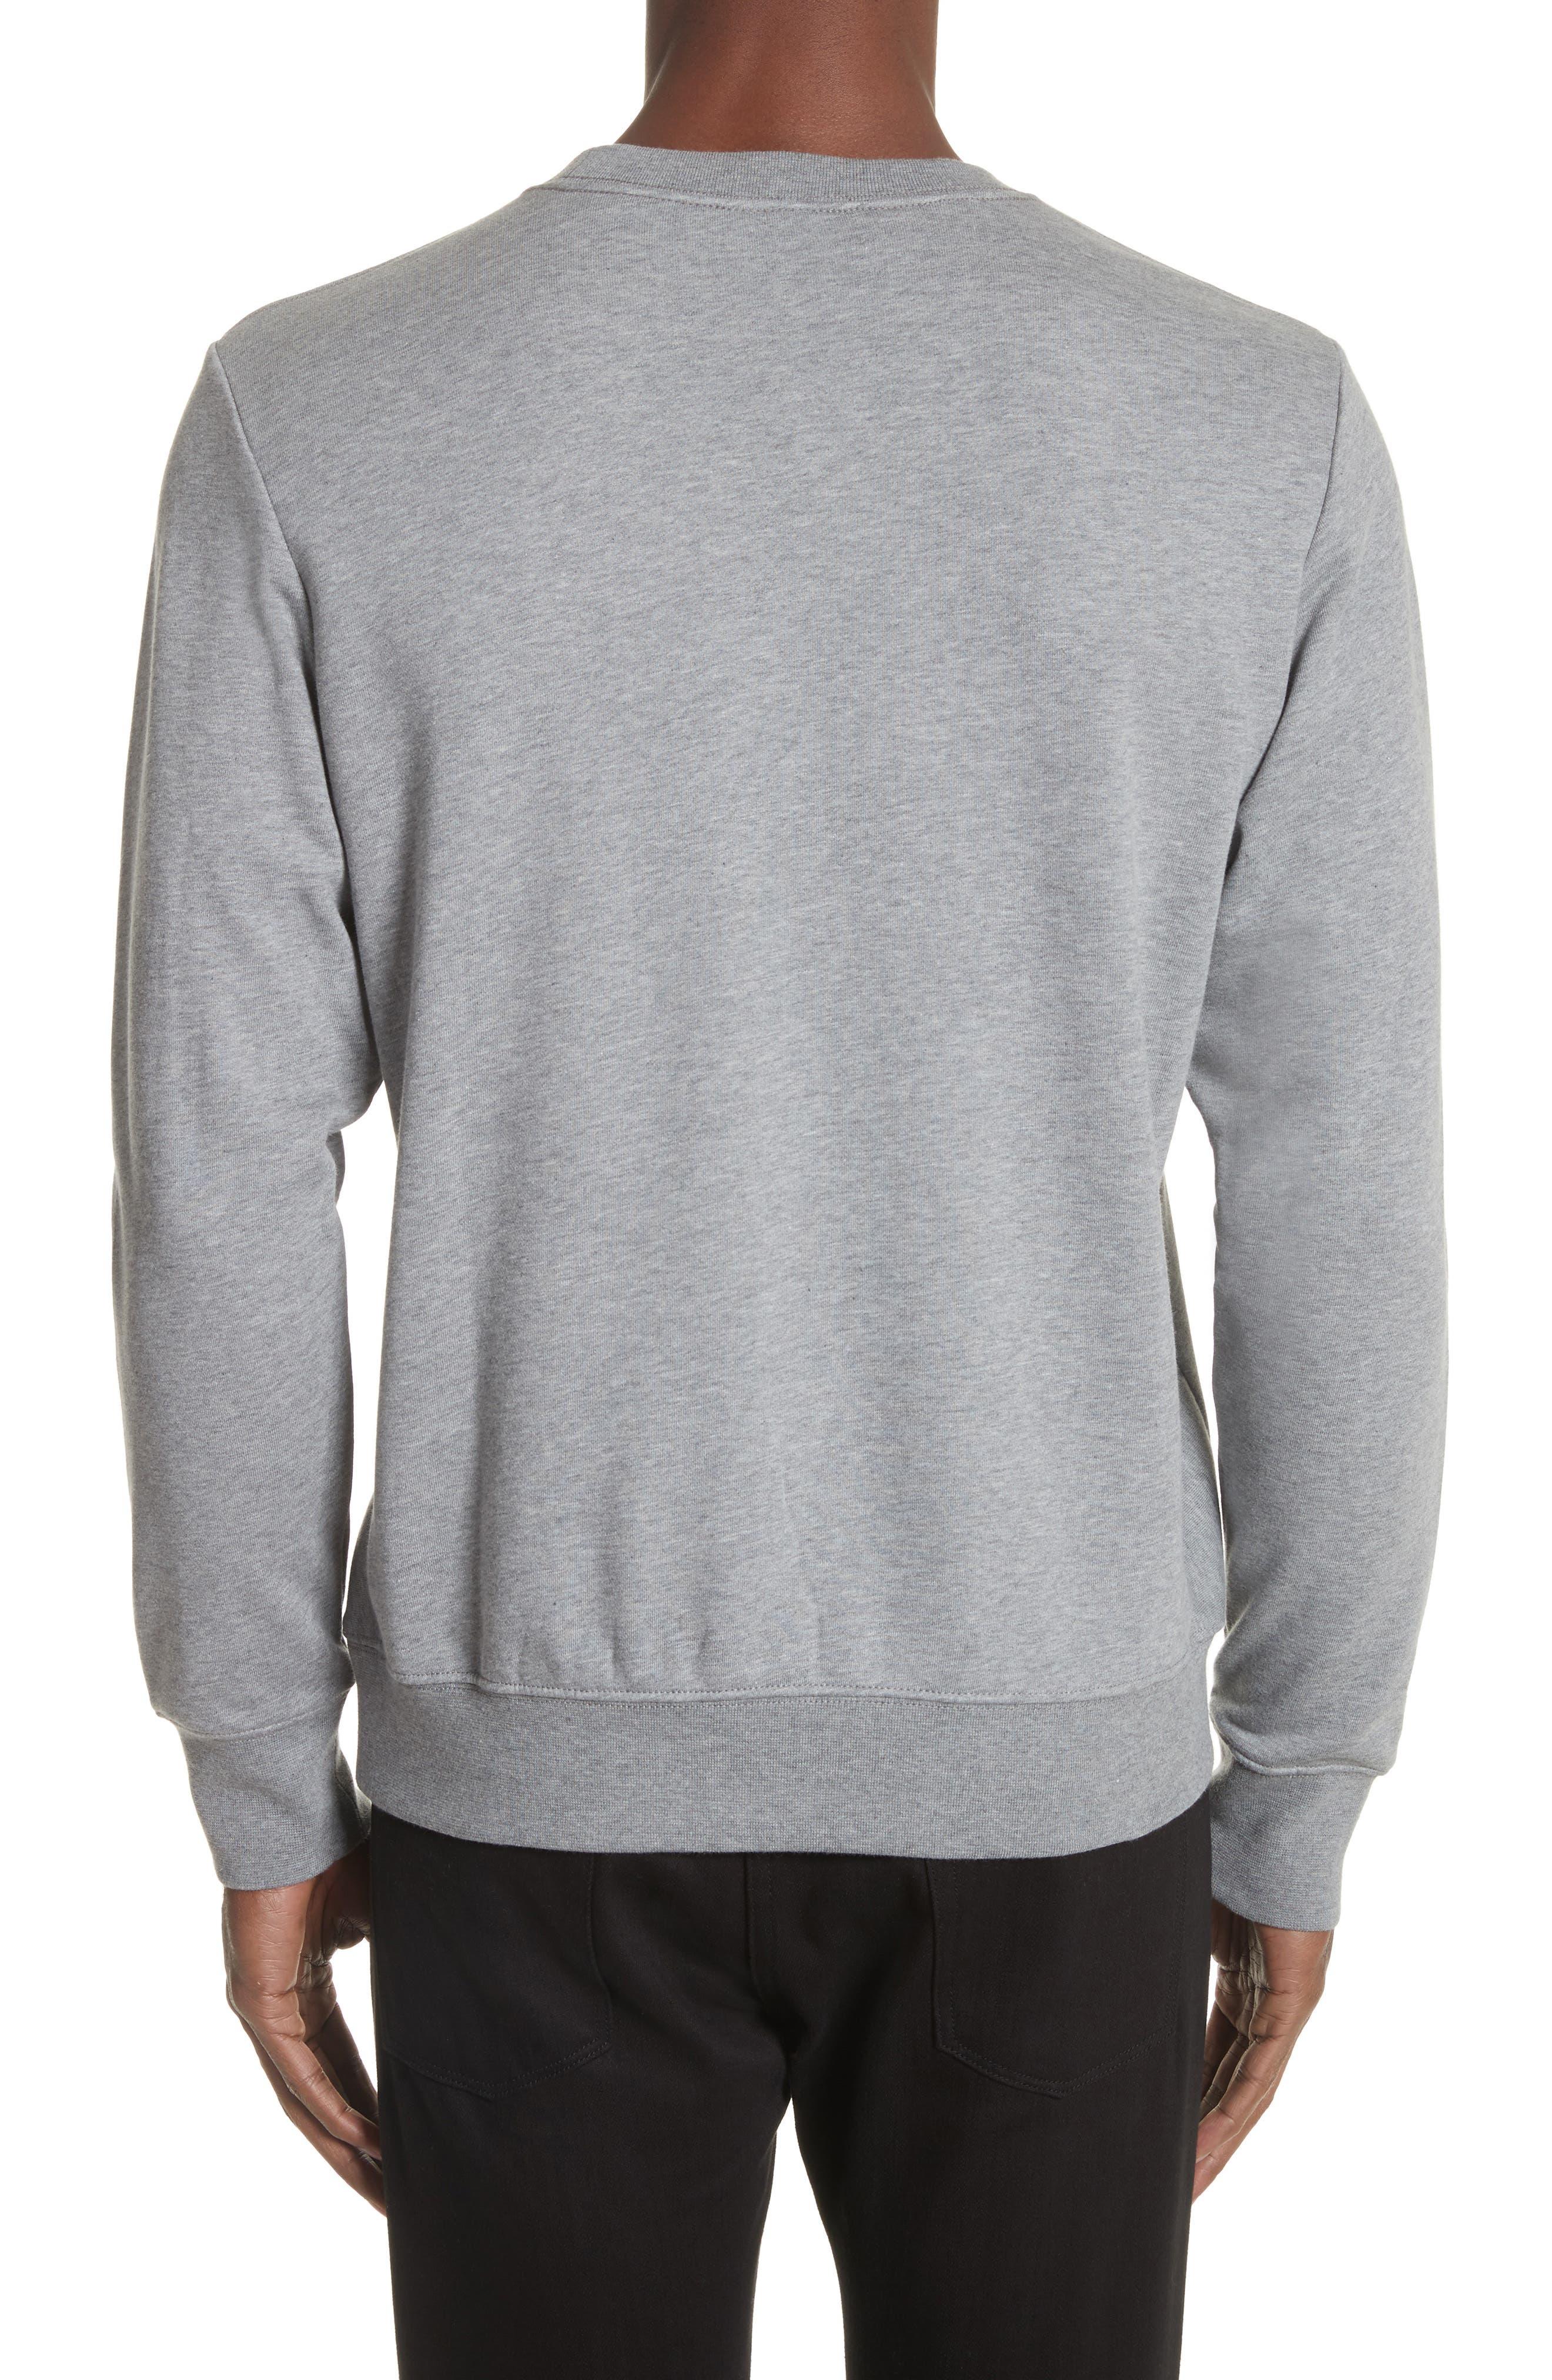 Dino Embroidered Crewneck Sweatshirt,                             Alternate thumbnail 2, color,